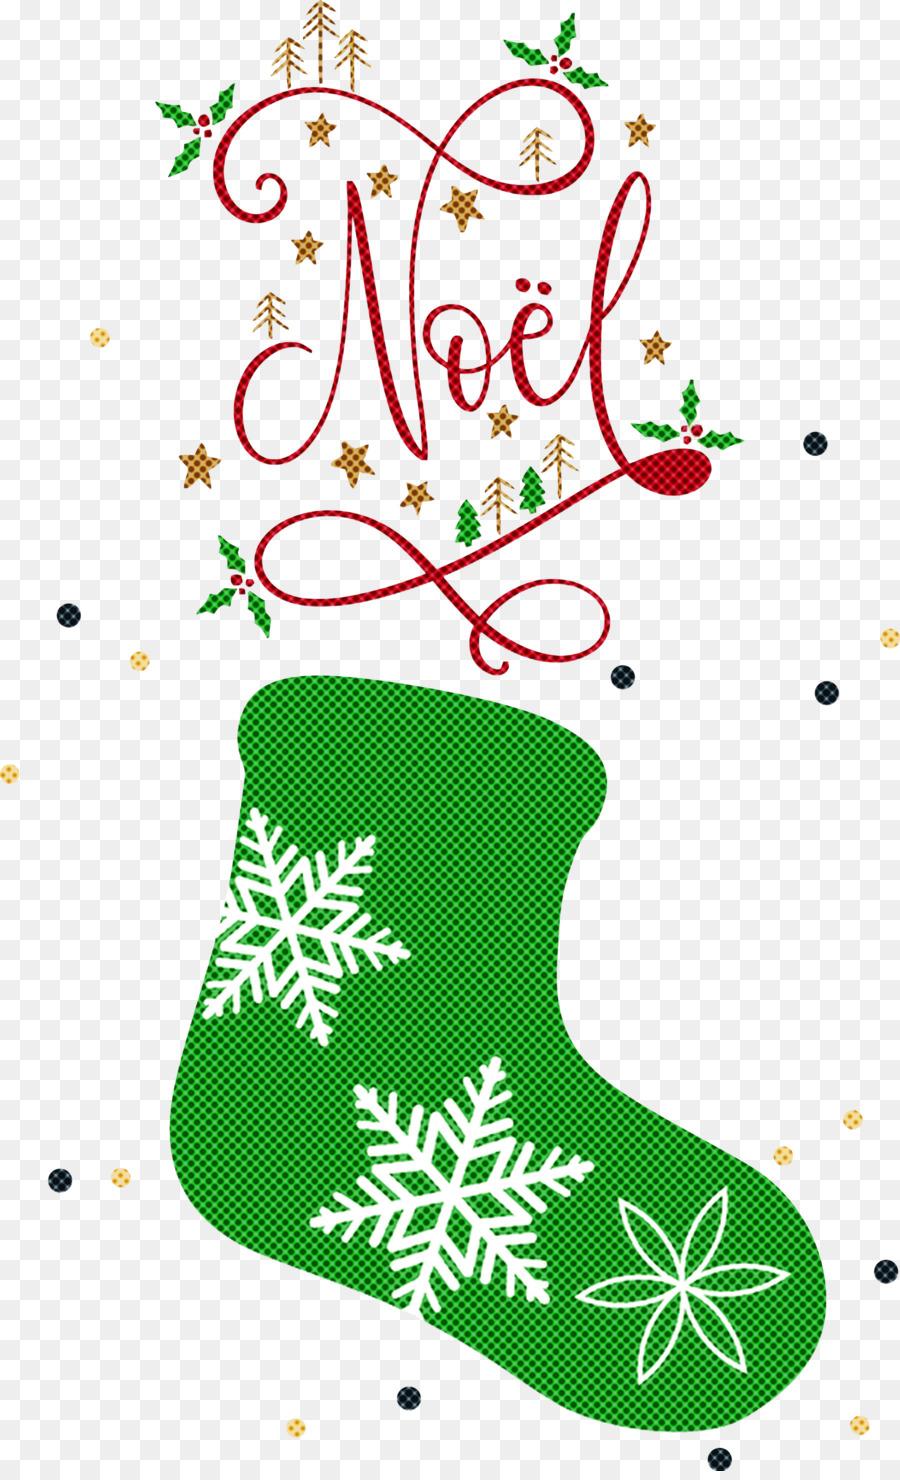 Descarga gratuita de Christmas Day, árbol De Navidad, Silueta Imágen de Png